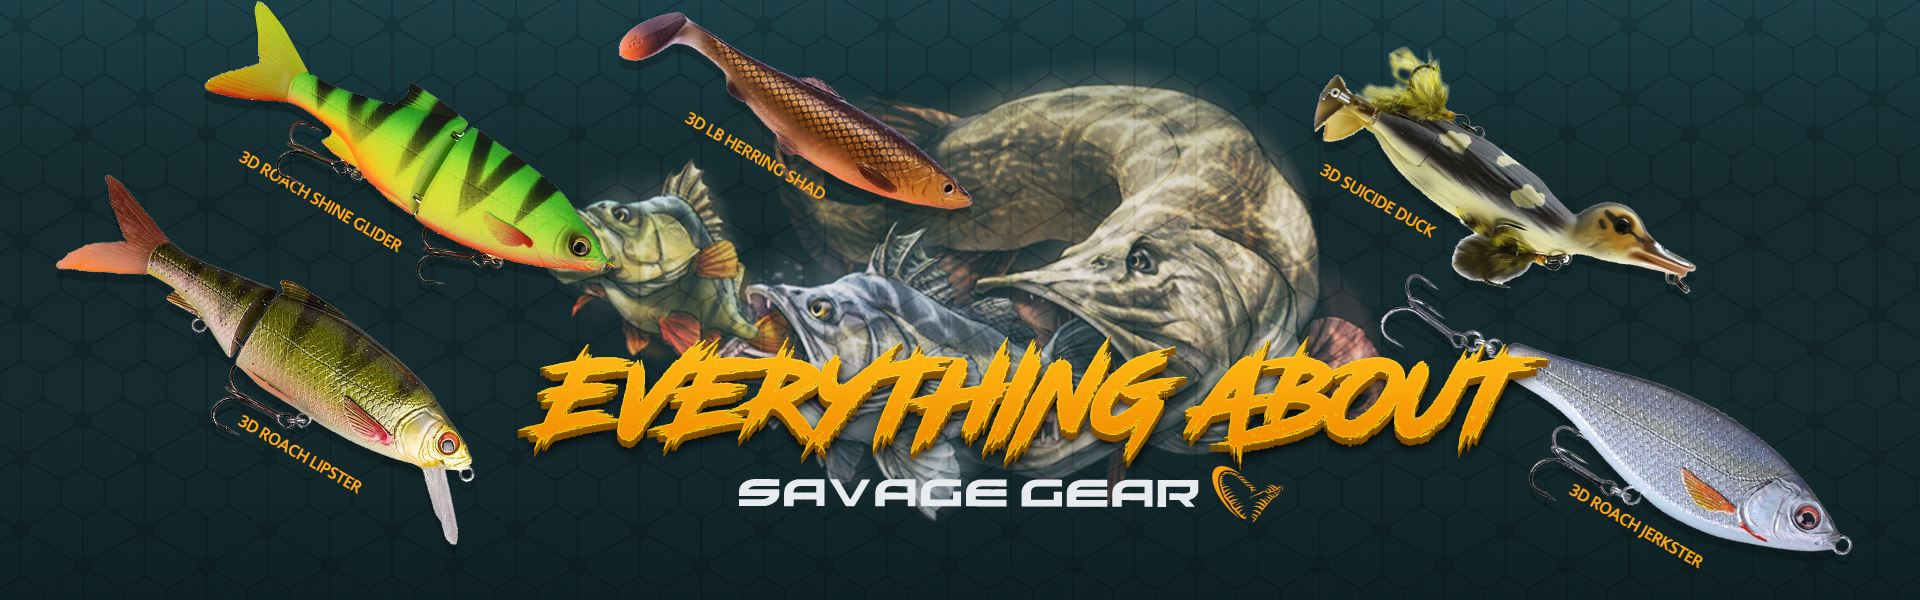 savage gear, savagegear, fishing, peche, sportingfisk, savage, suicide duck, pike, luccio